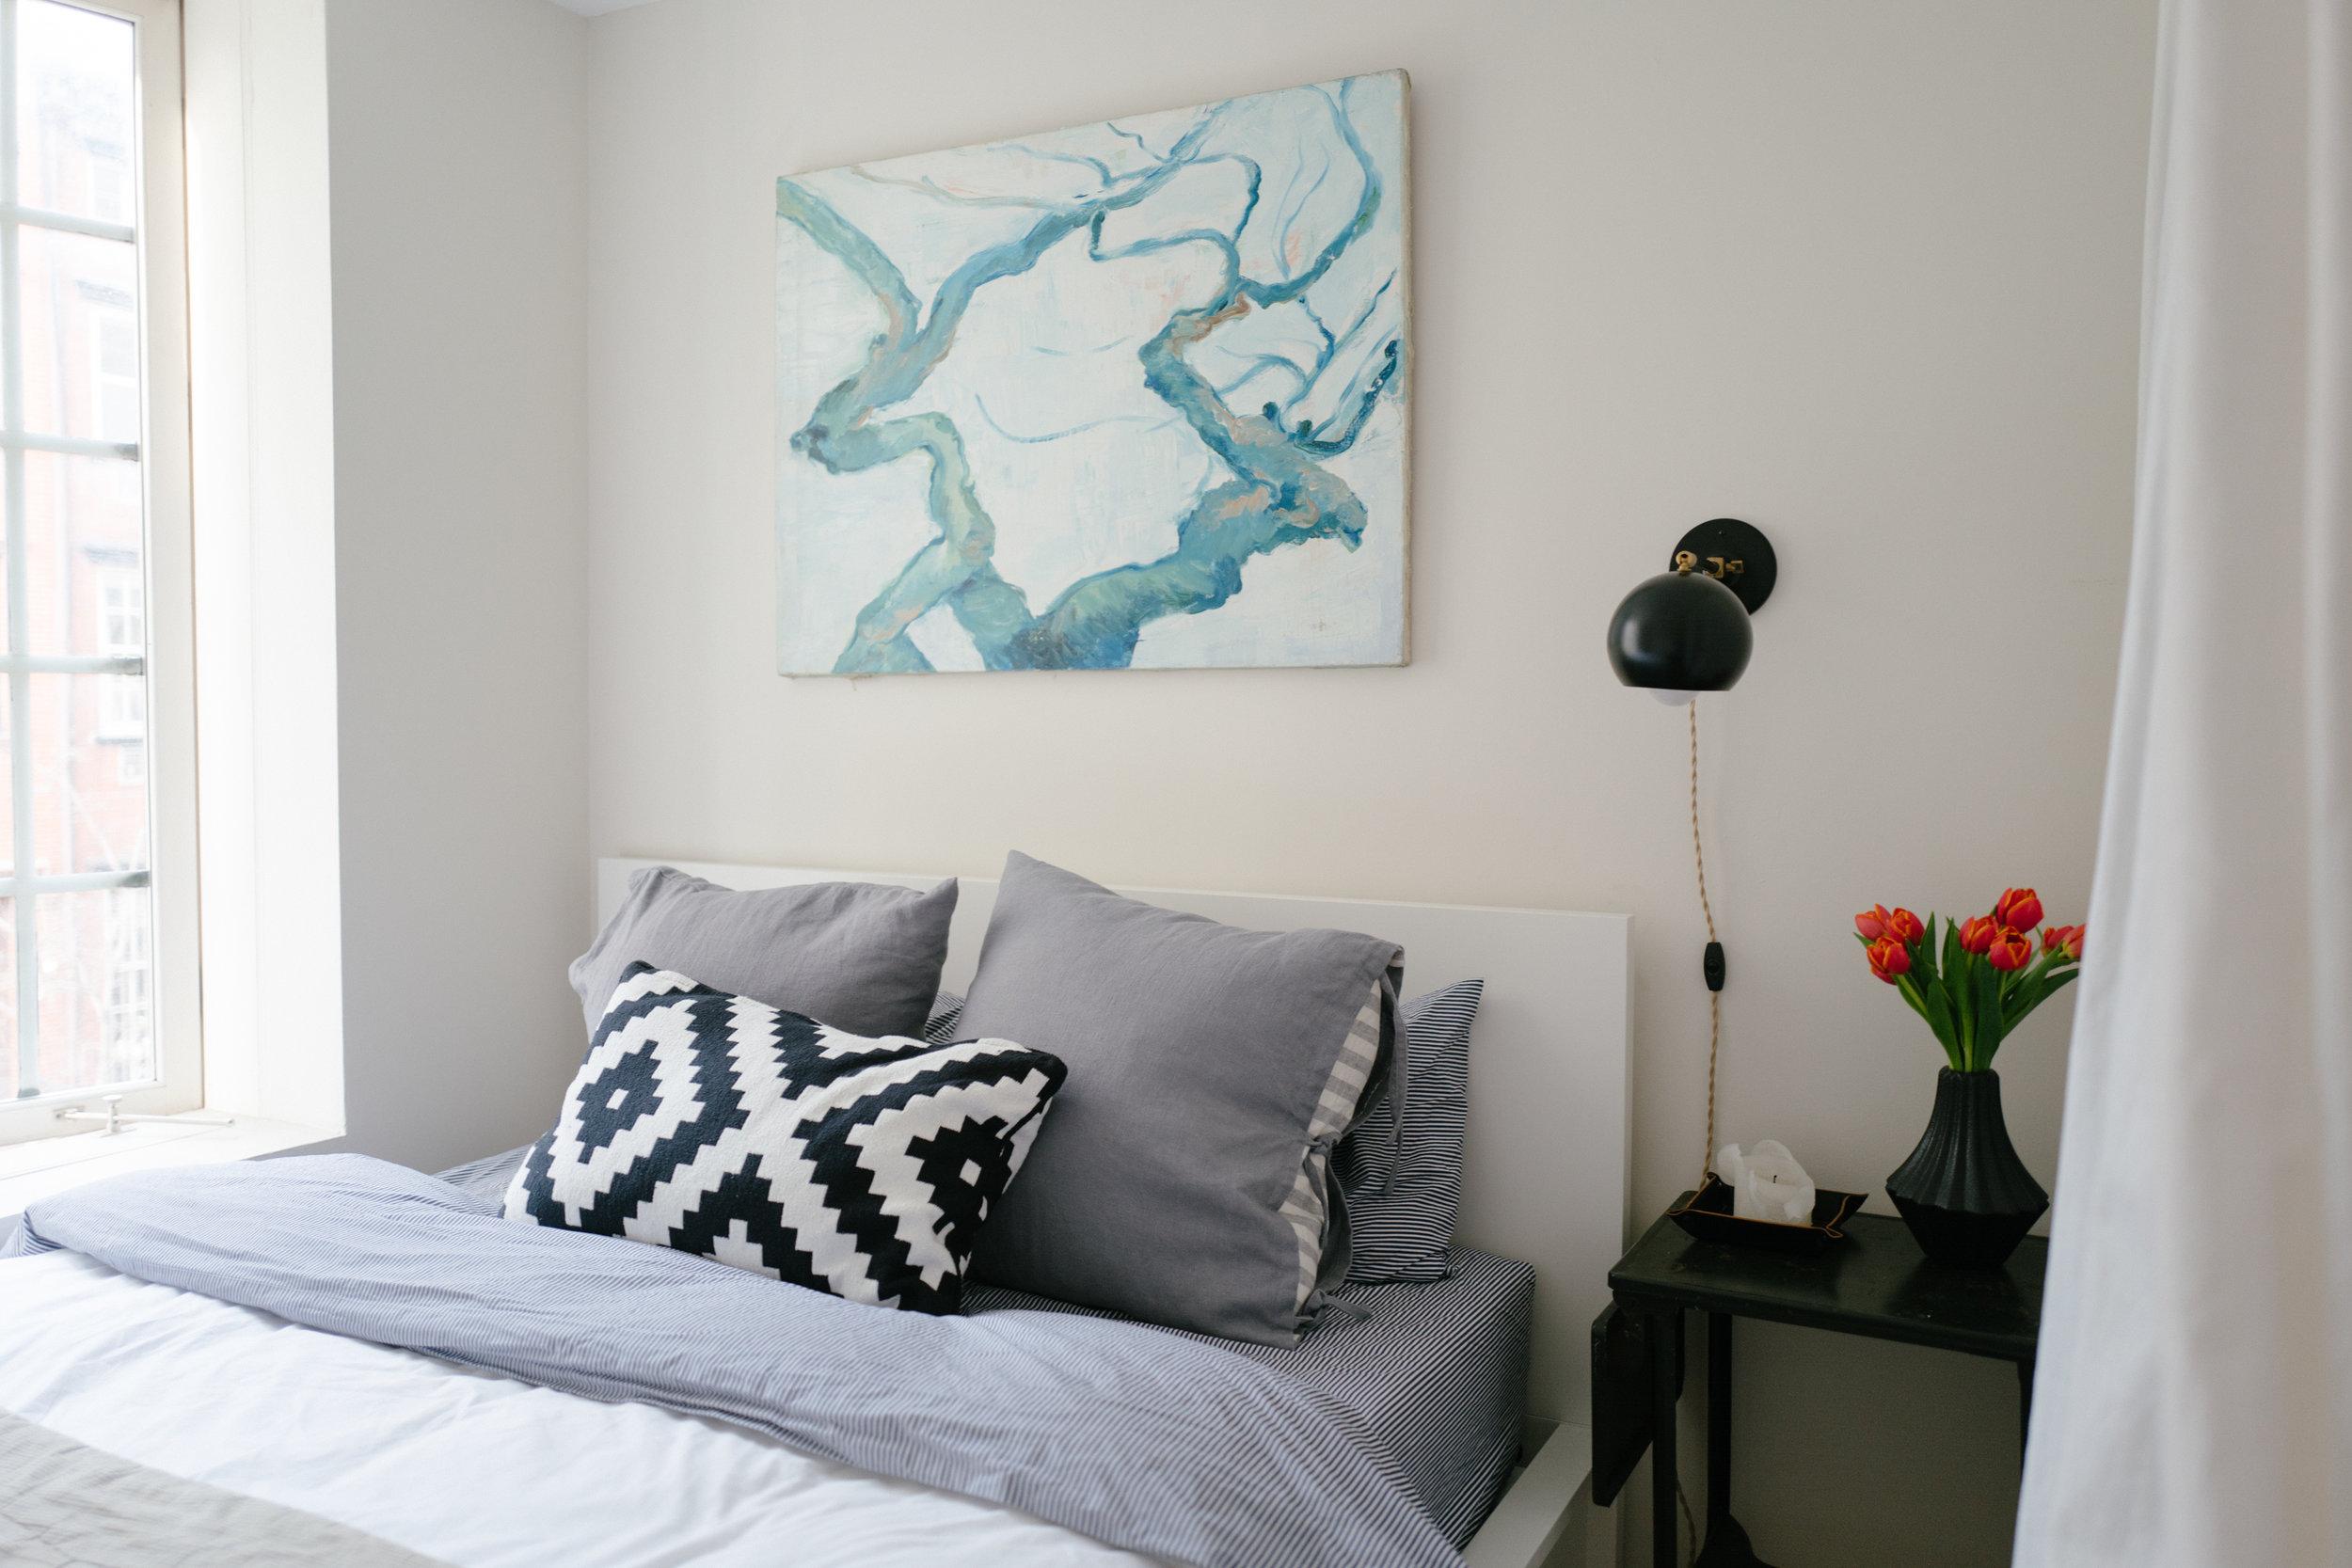 Wall sconce:  Schoolhouse Electric . Bed:  Ikea . Bedding:  Brooklinen . Black table: Vintage,  similar . Black vase:  CB2 . Shams:  Ikea .